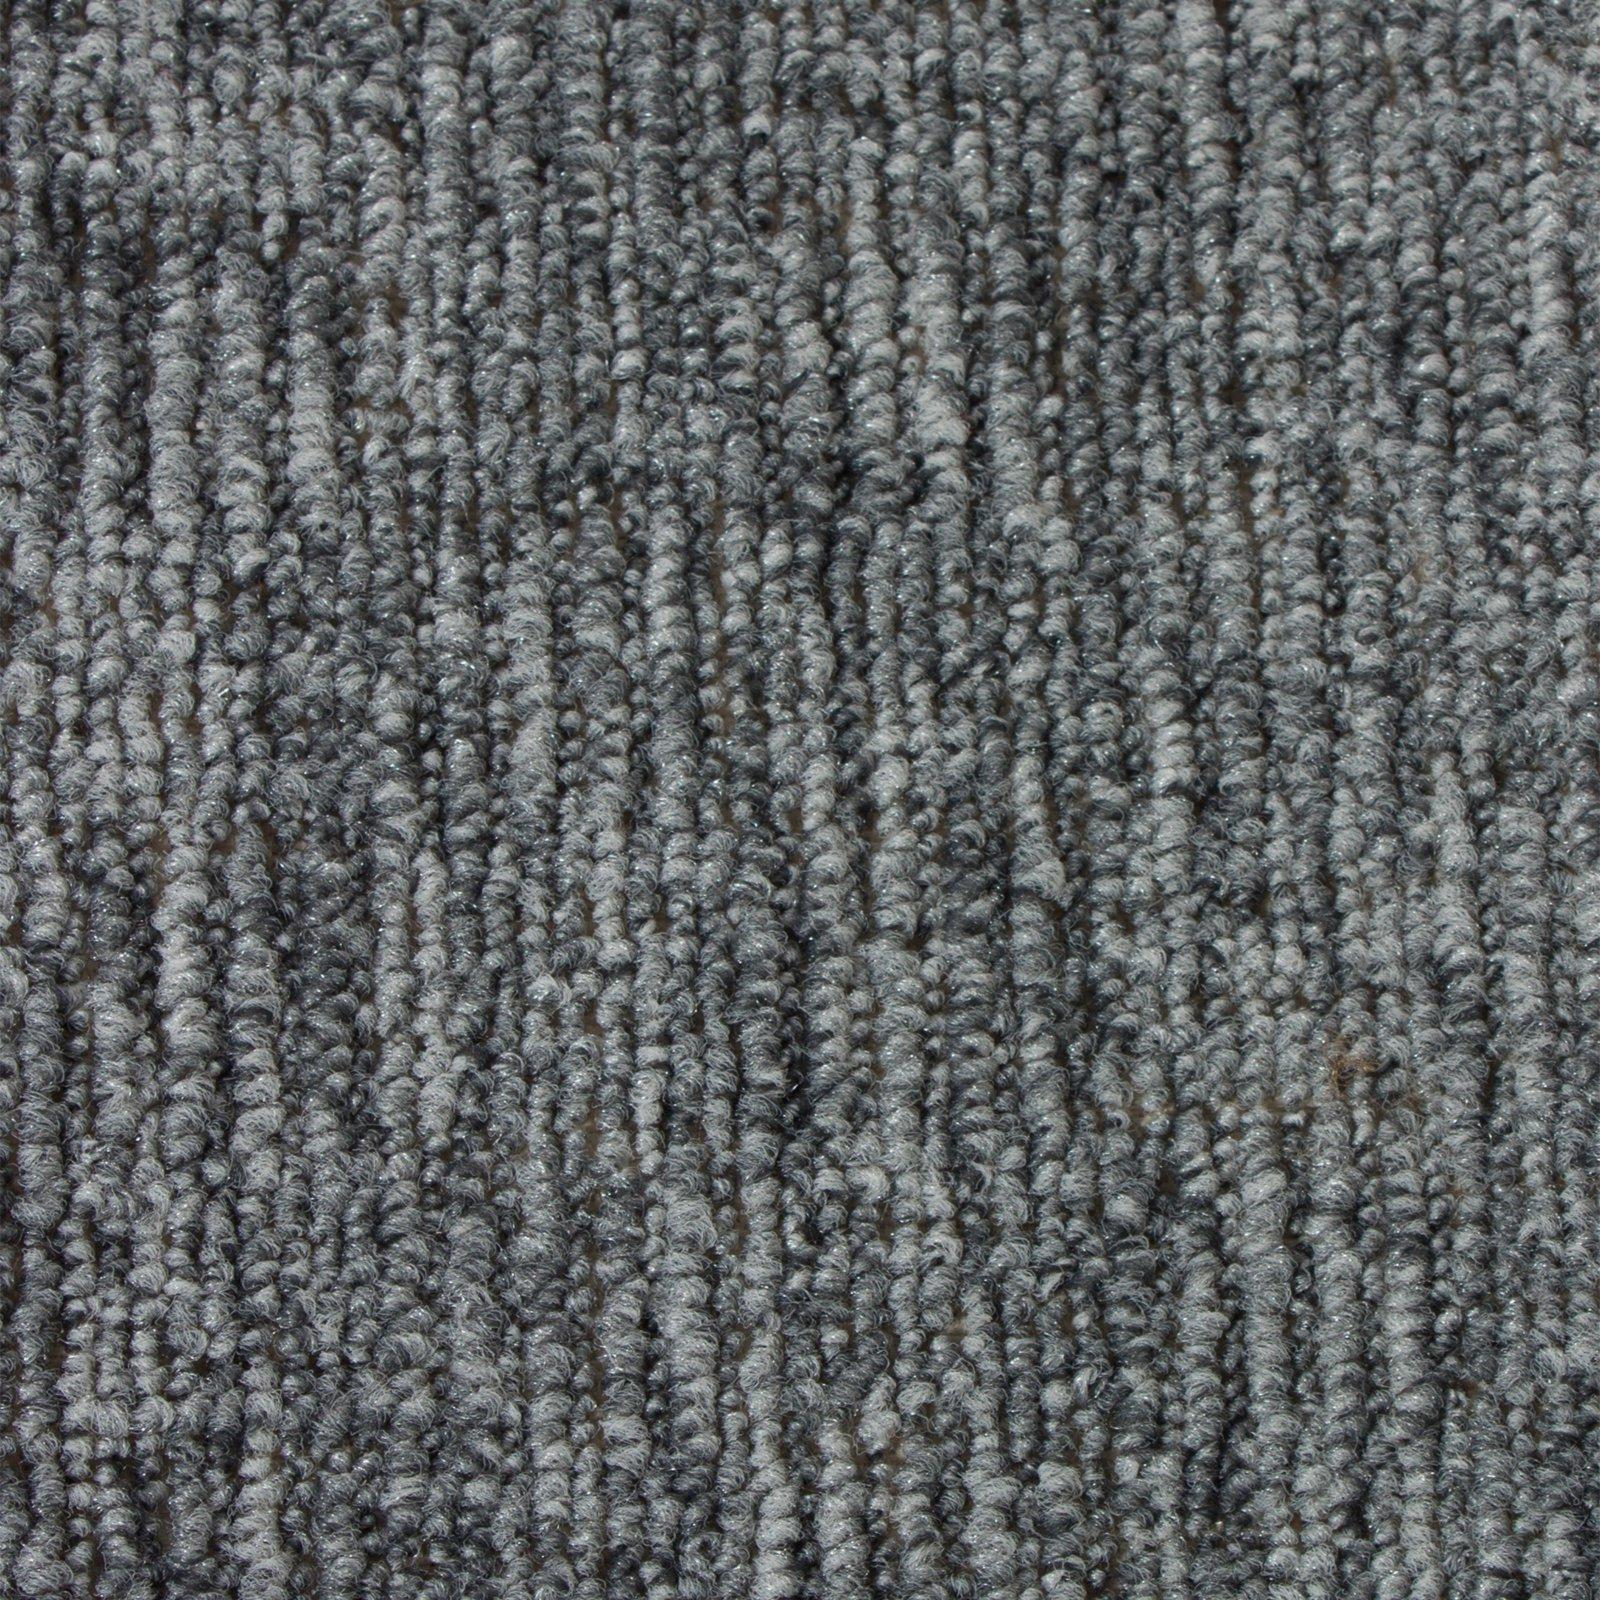 teppichboden troje grau 5 meter breit teppichboden. Black Bedroom Furniture Sets. Home Design Ideas